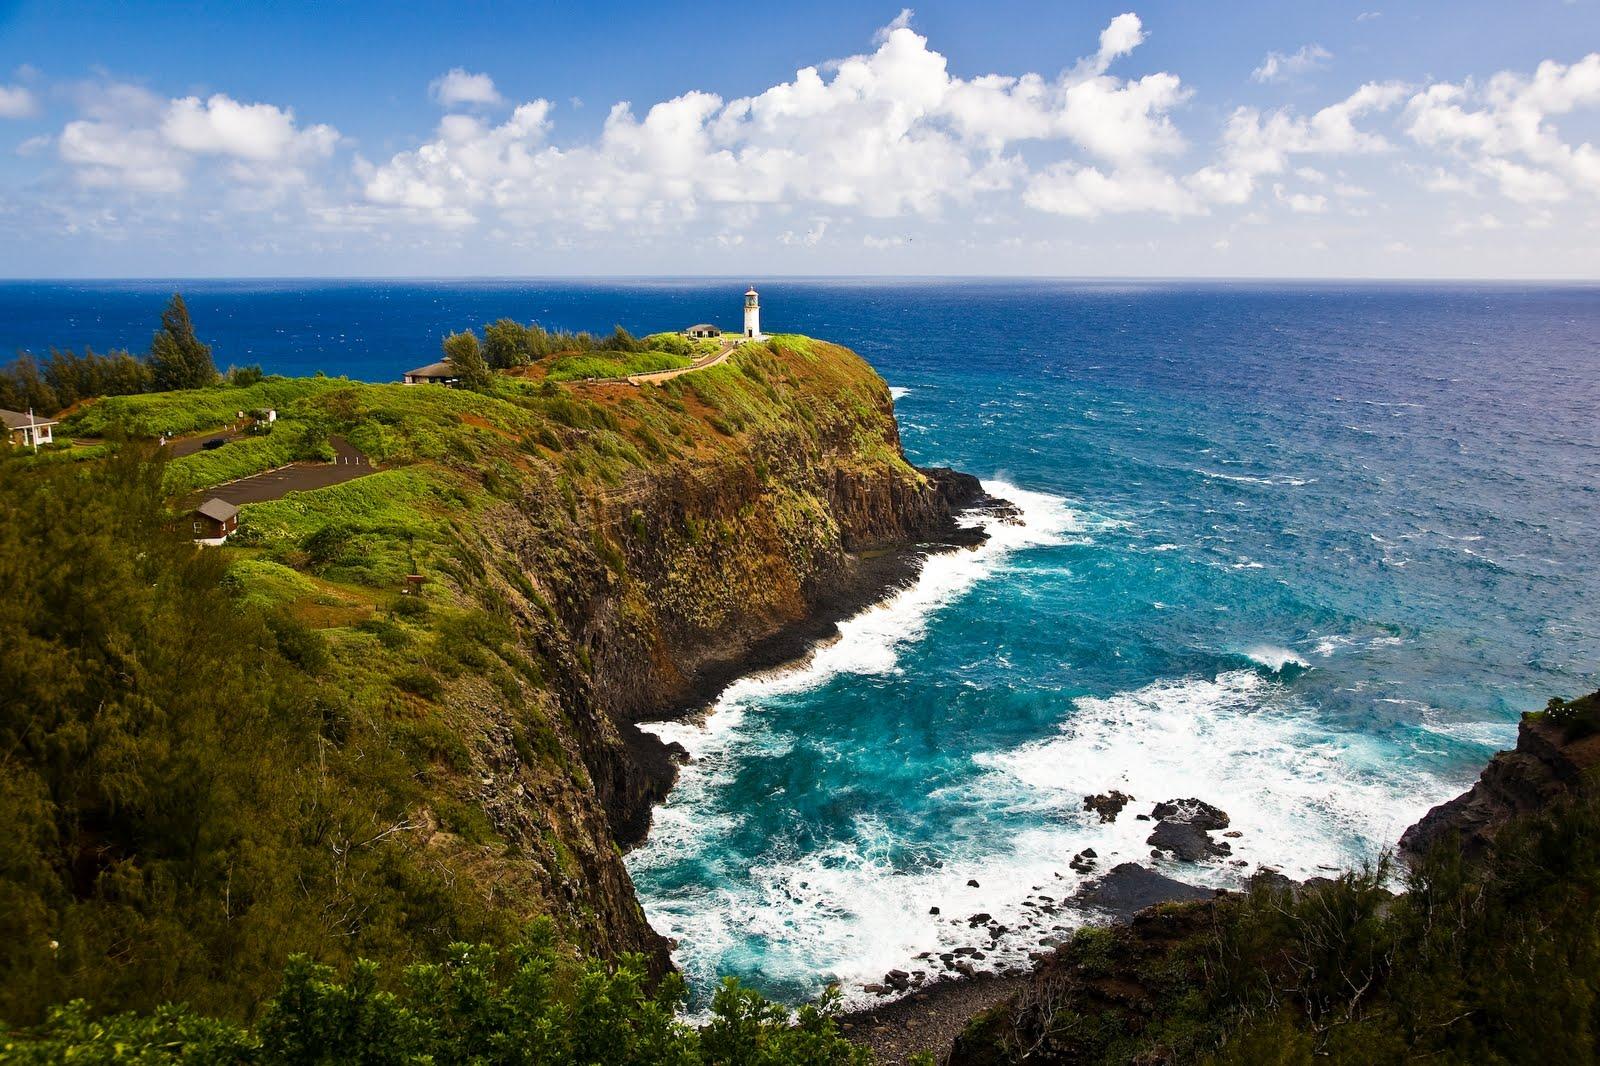 Kauai Hawaii: Honeymoons And Destination Wedding Travel Packages To